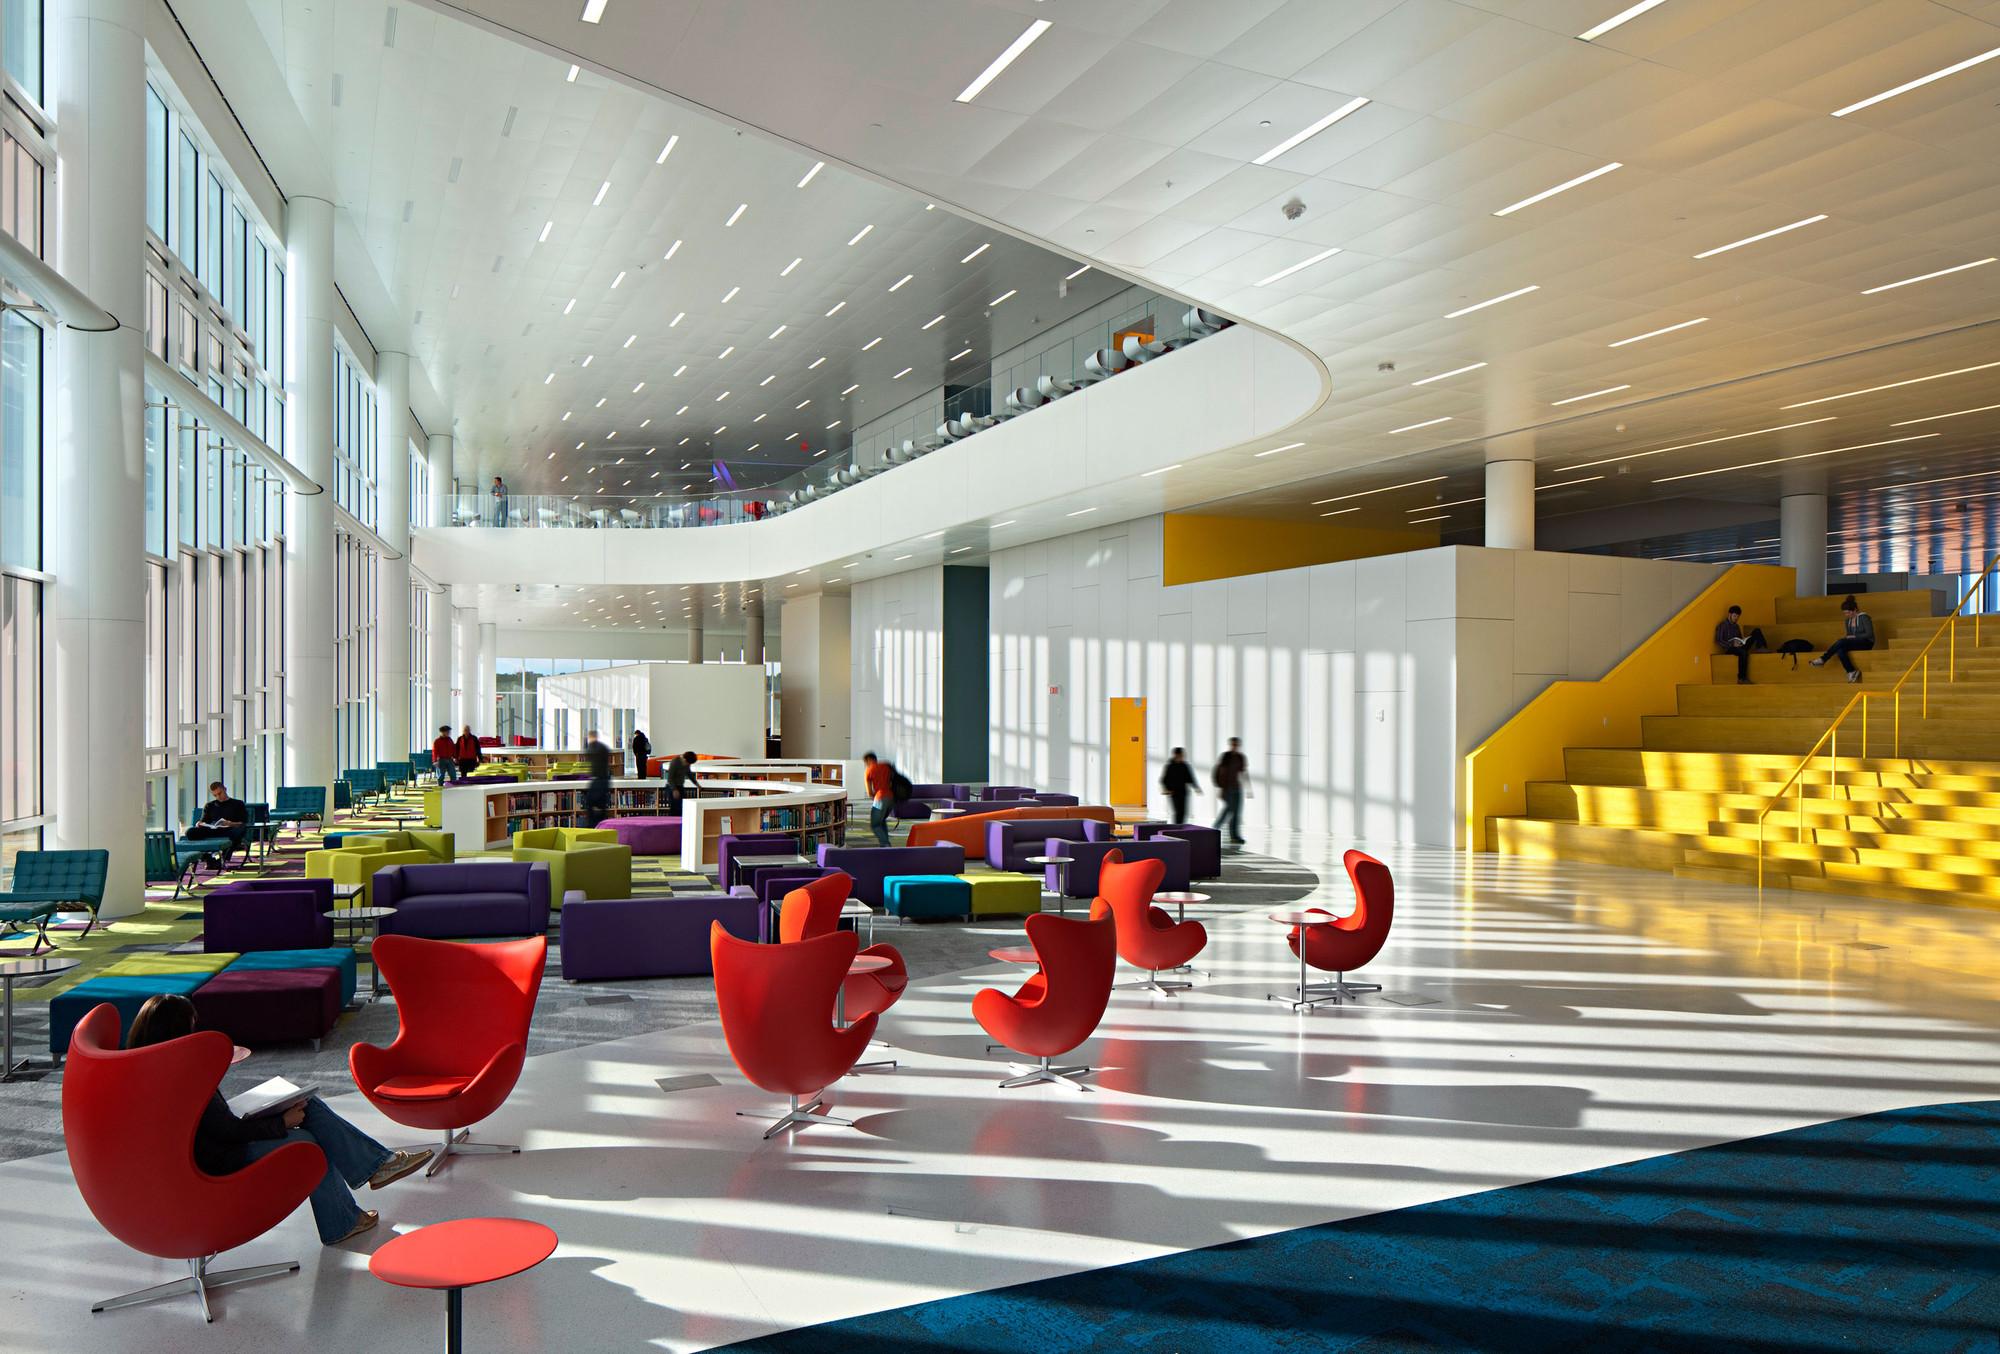 New York School Interior Design Certificate Program